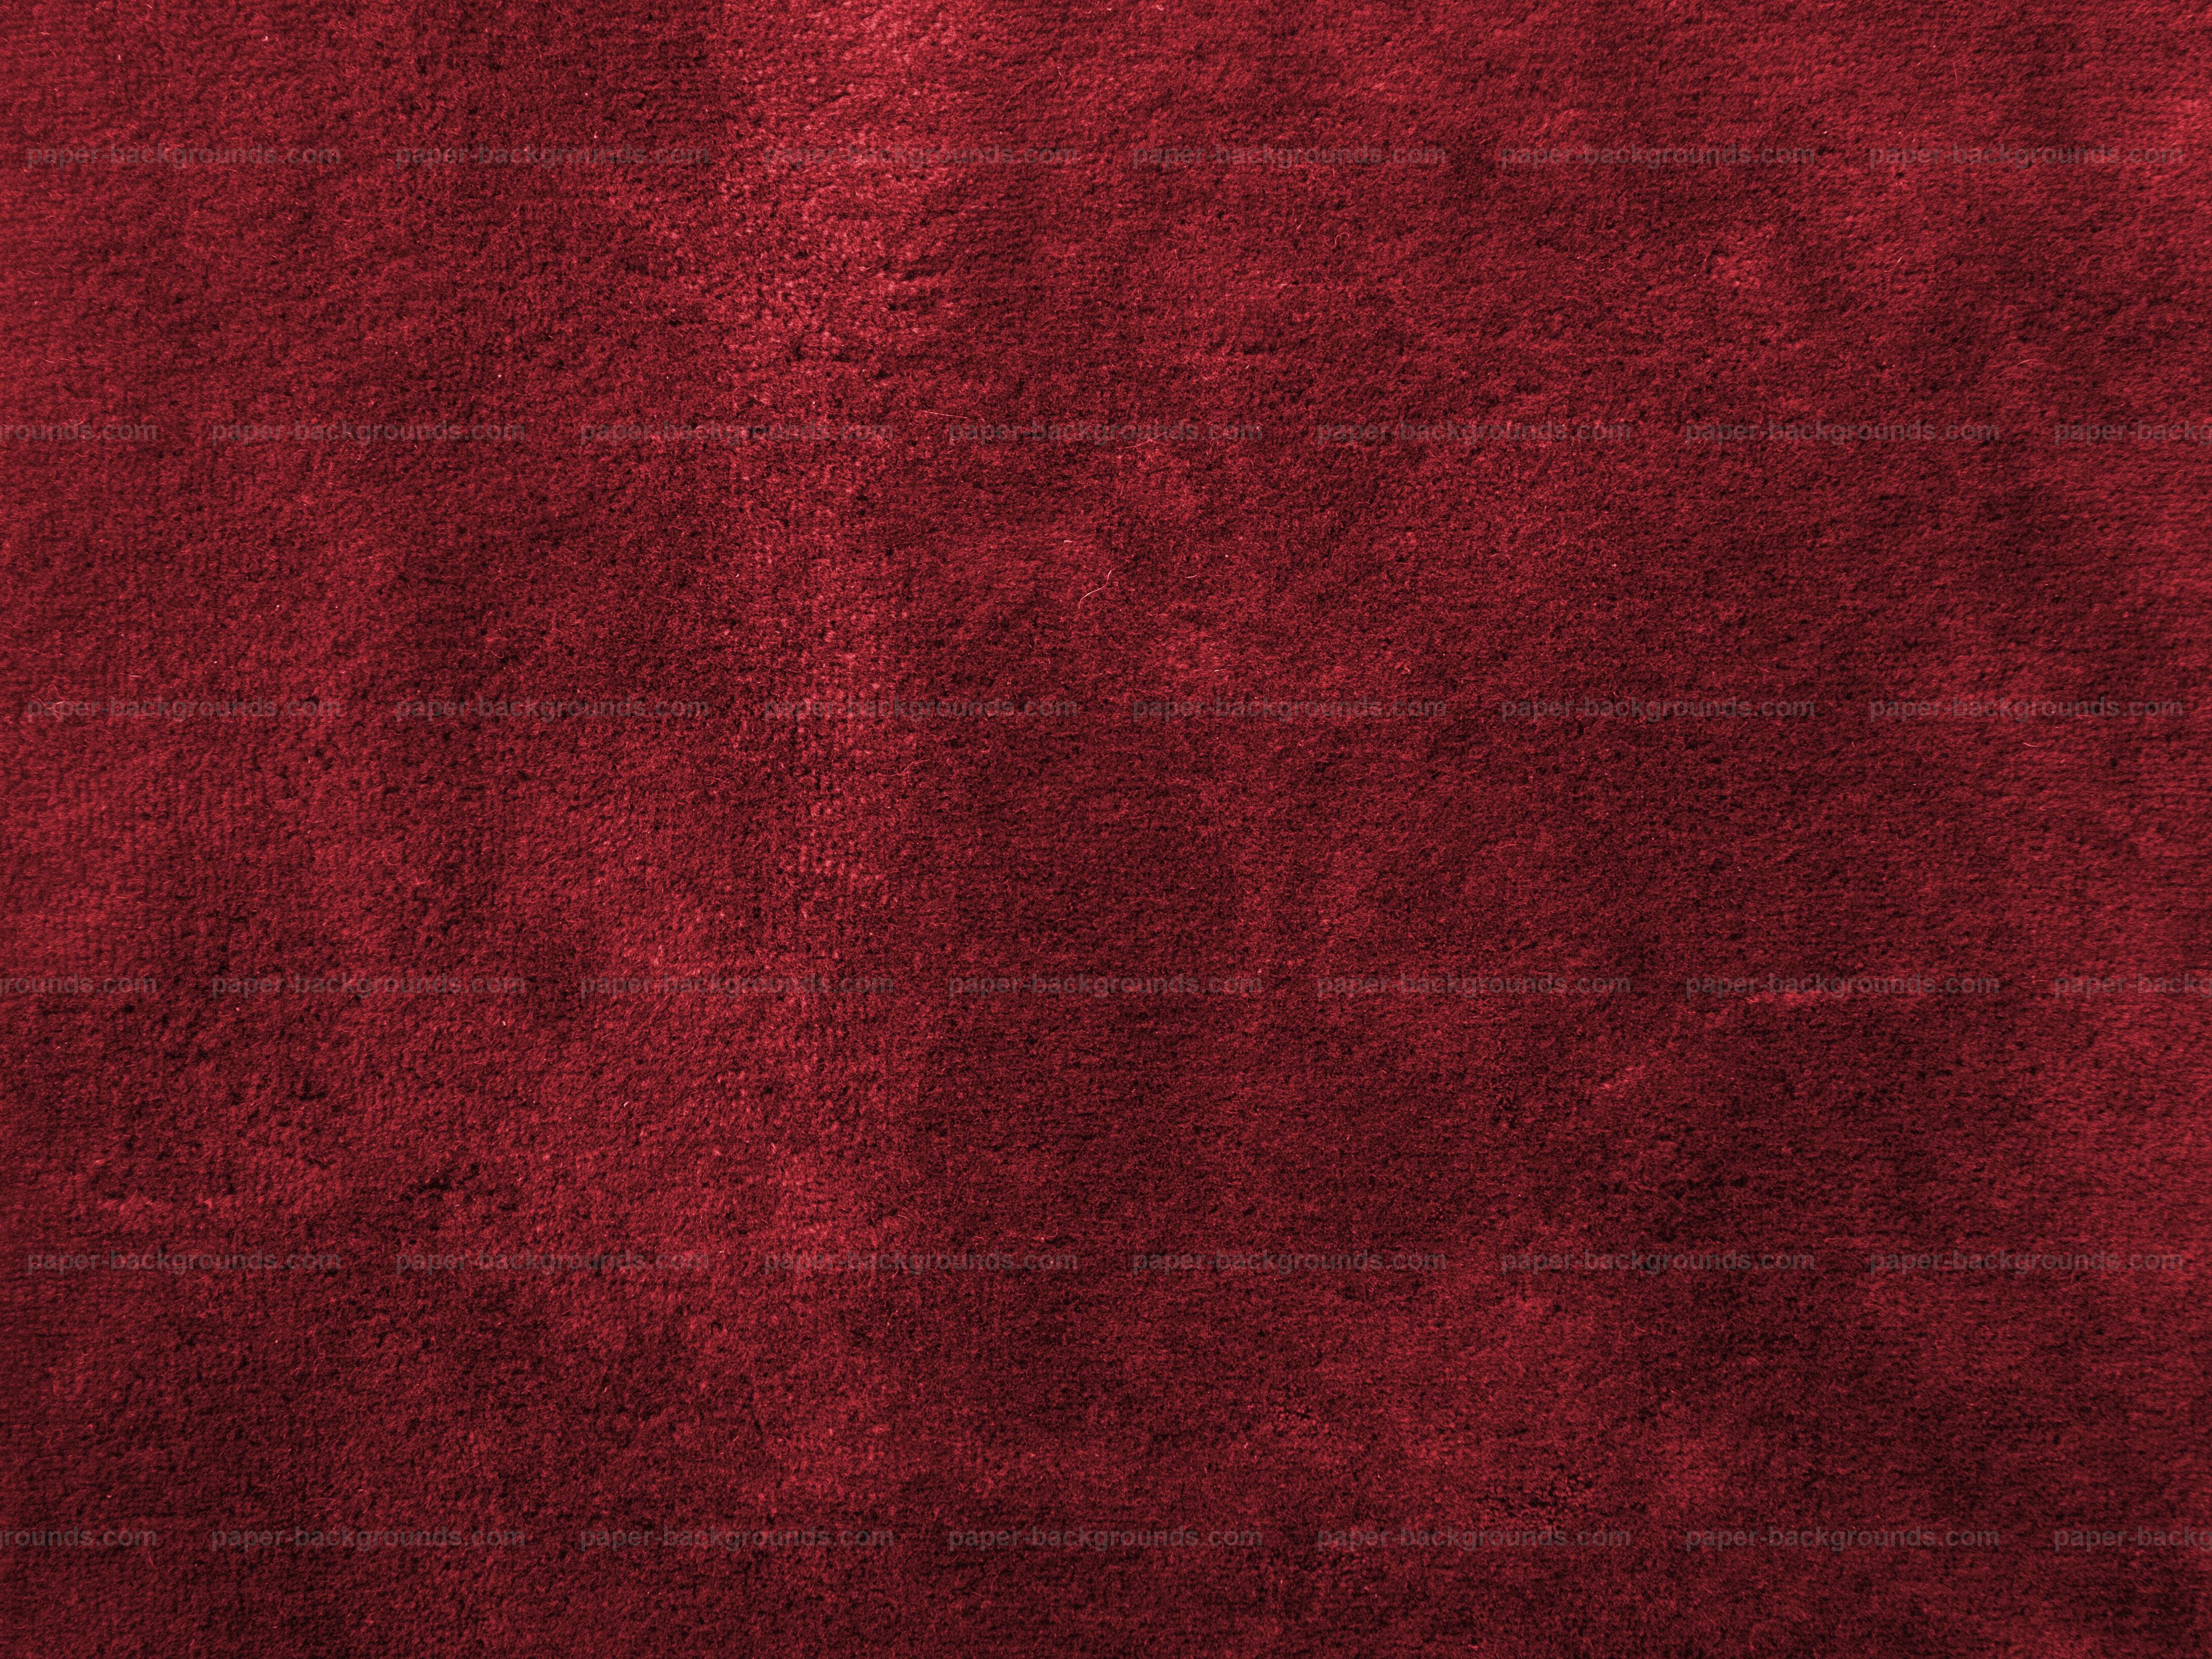 Paper Backgrounds | Red Velvet Texture Background